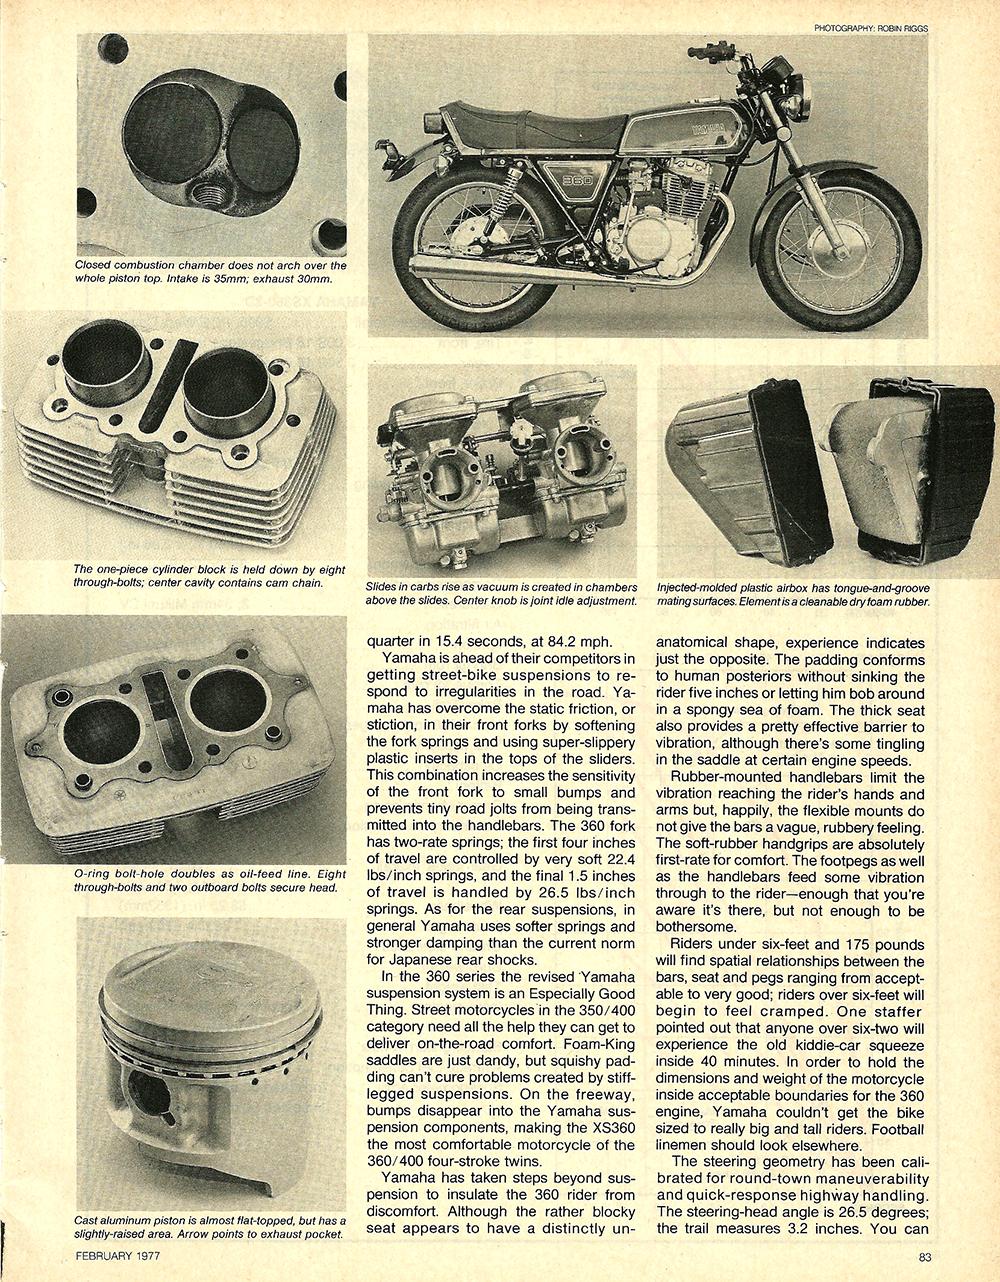 1977 Yamaha XS360-2D road test 3.jpg